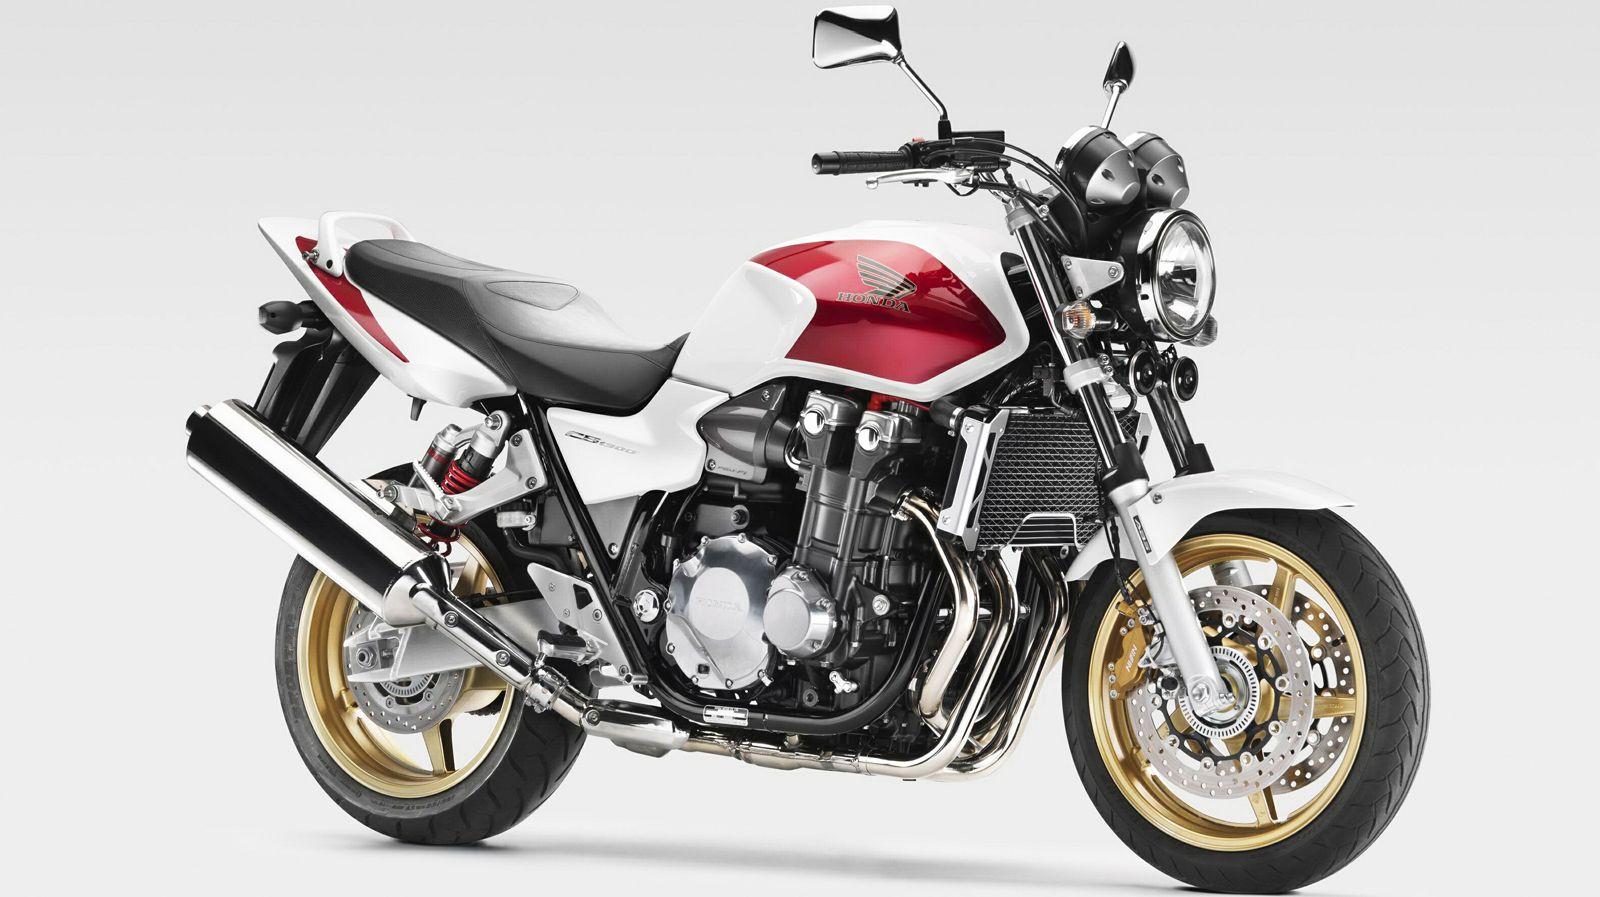 Memorable Motorcycles Honda CB1300A